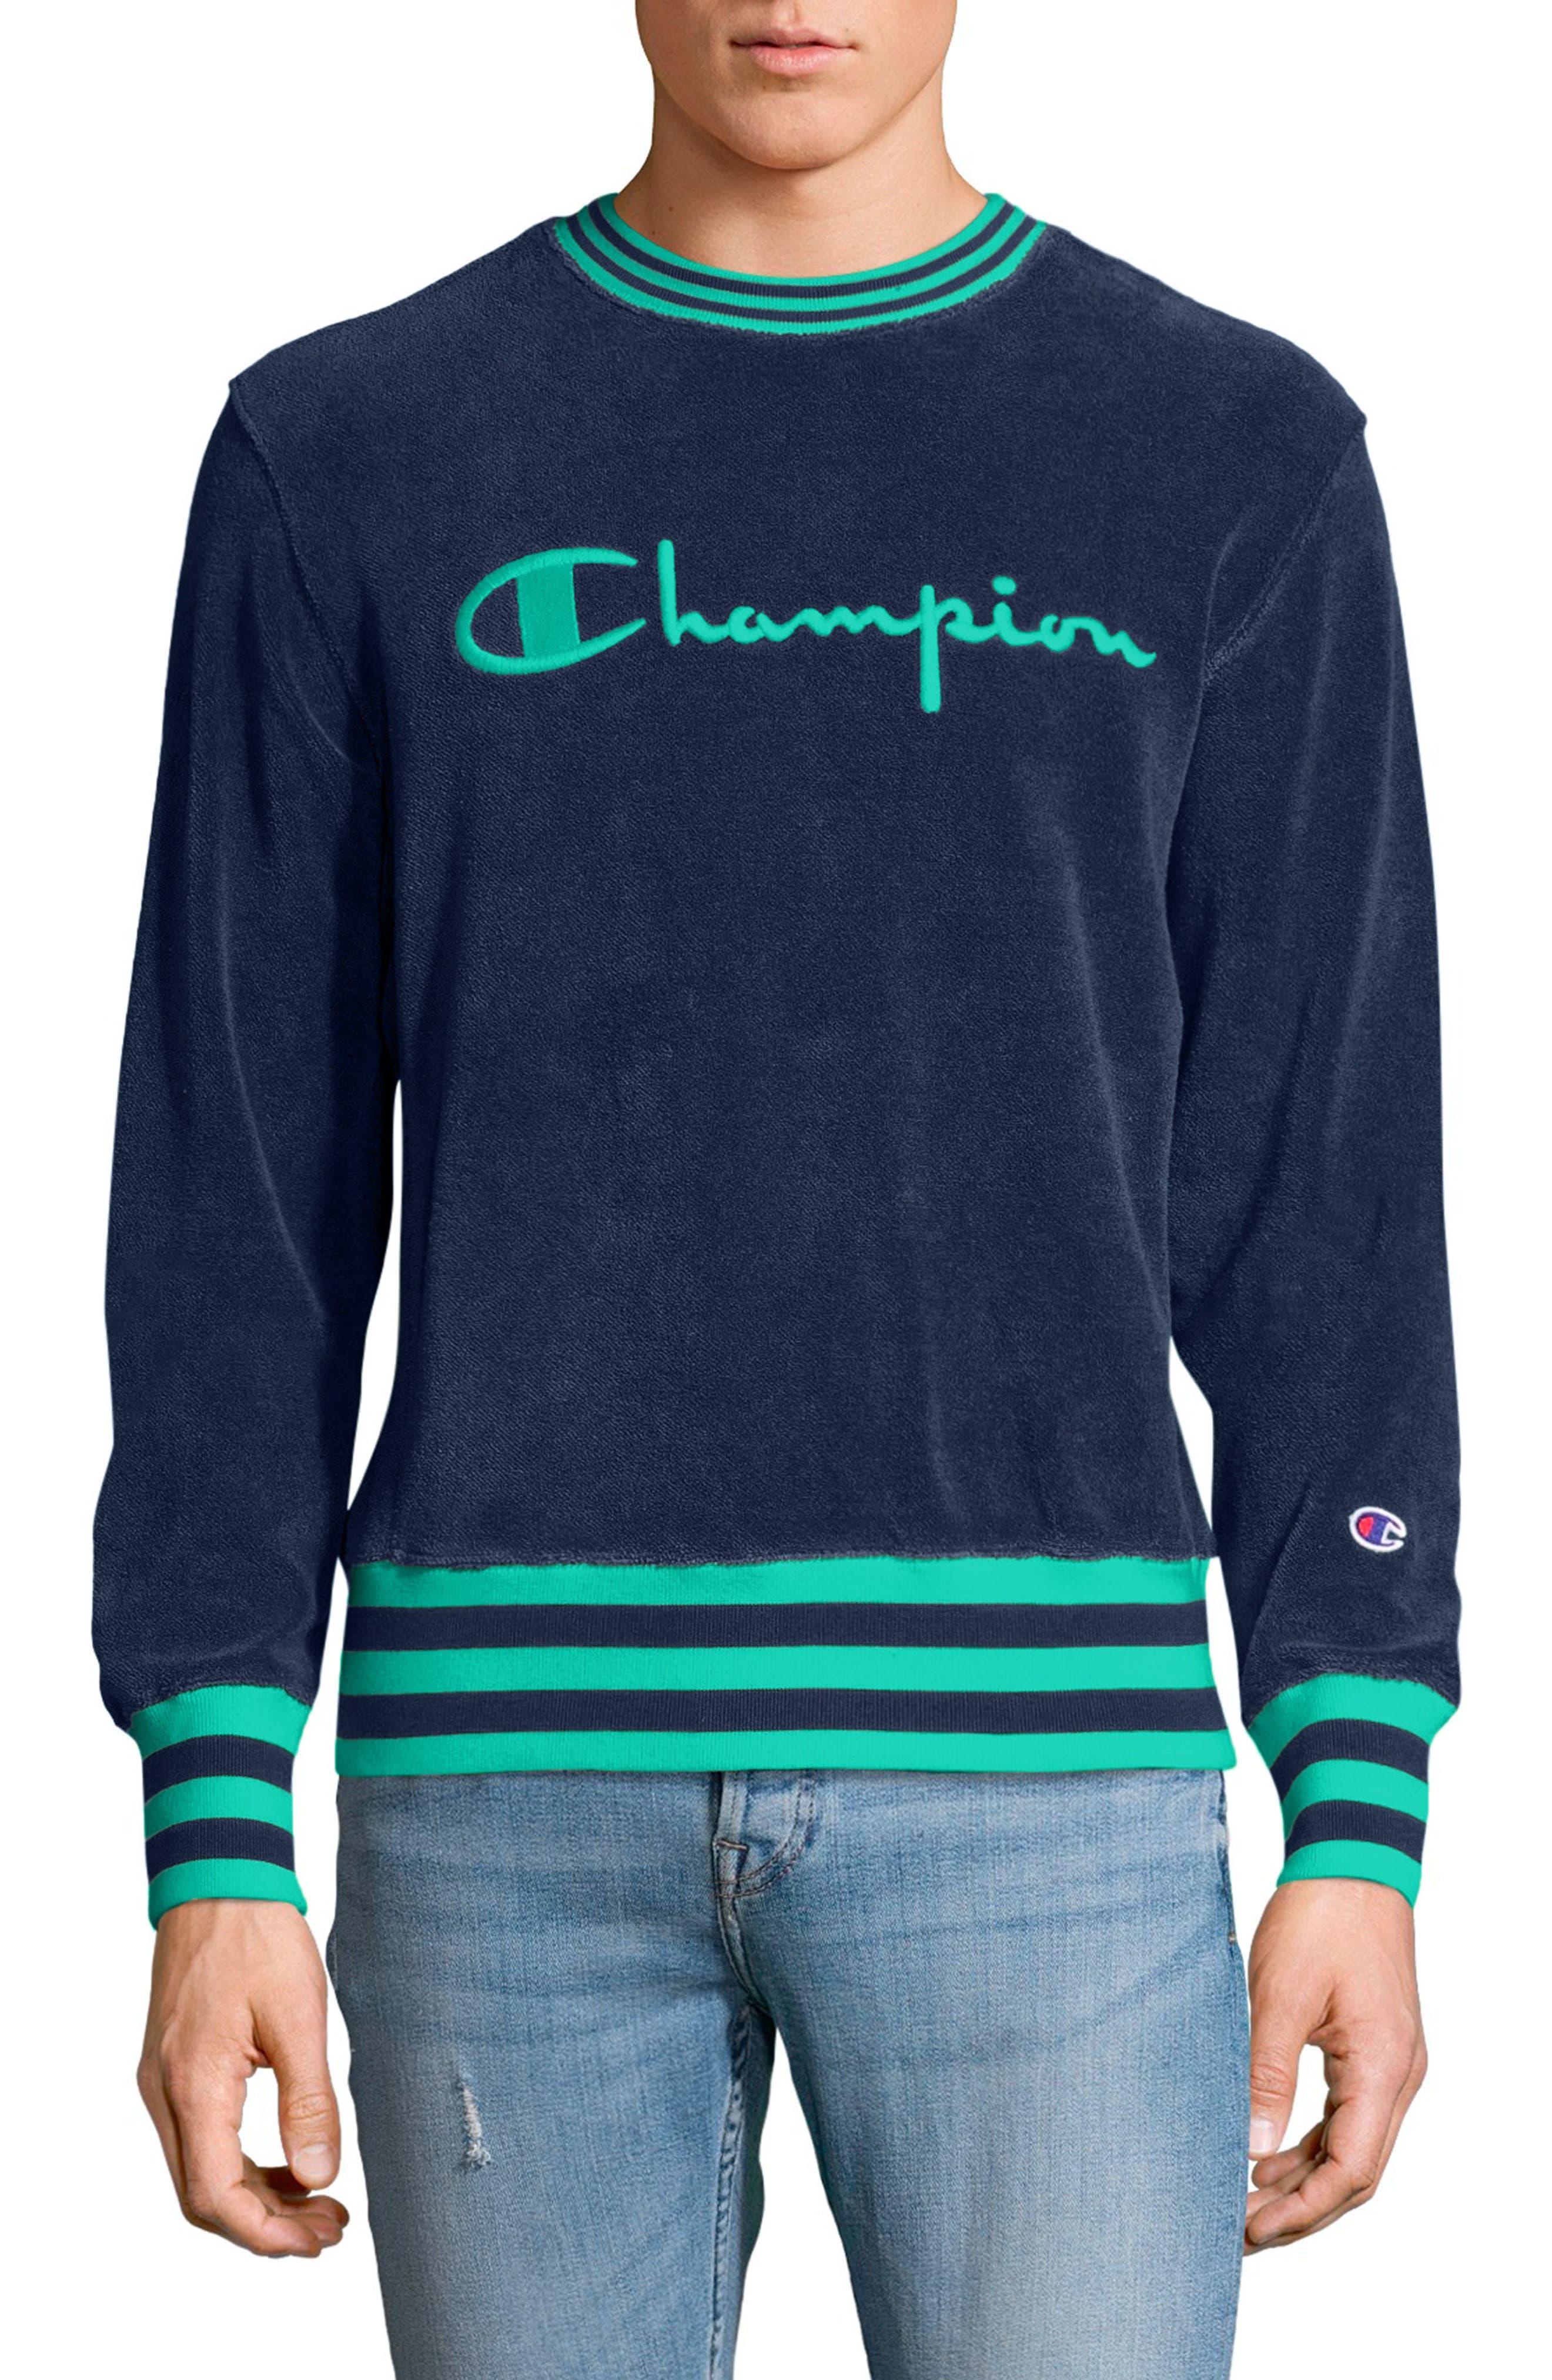 Sponge Terry Crewneck Sweatshirt,                             Main thumbnail 1, color,                             Navy